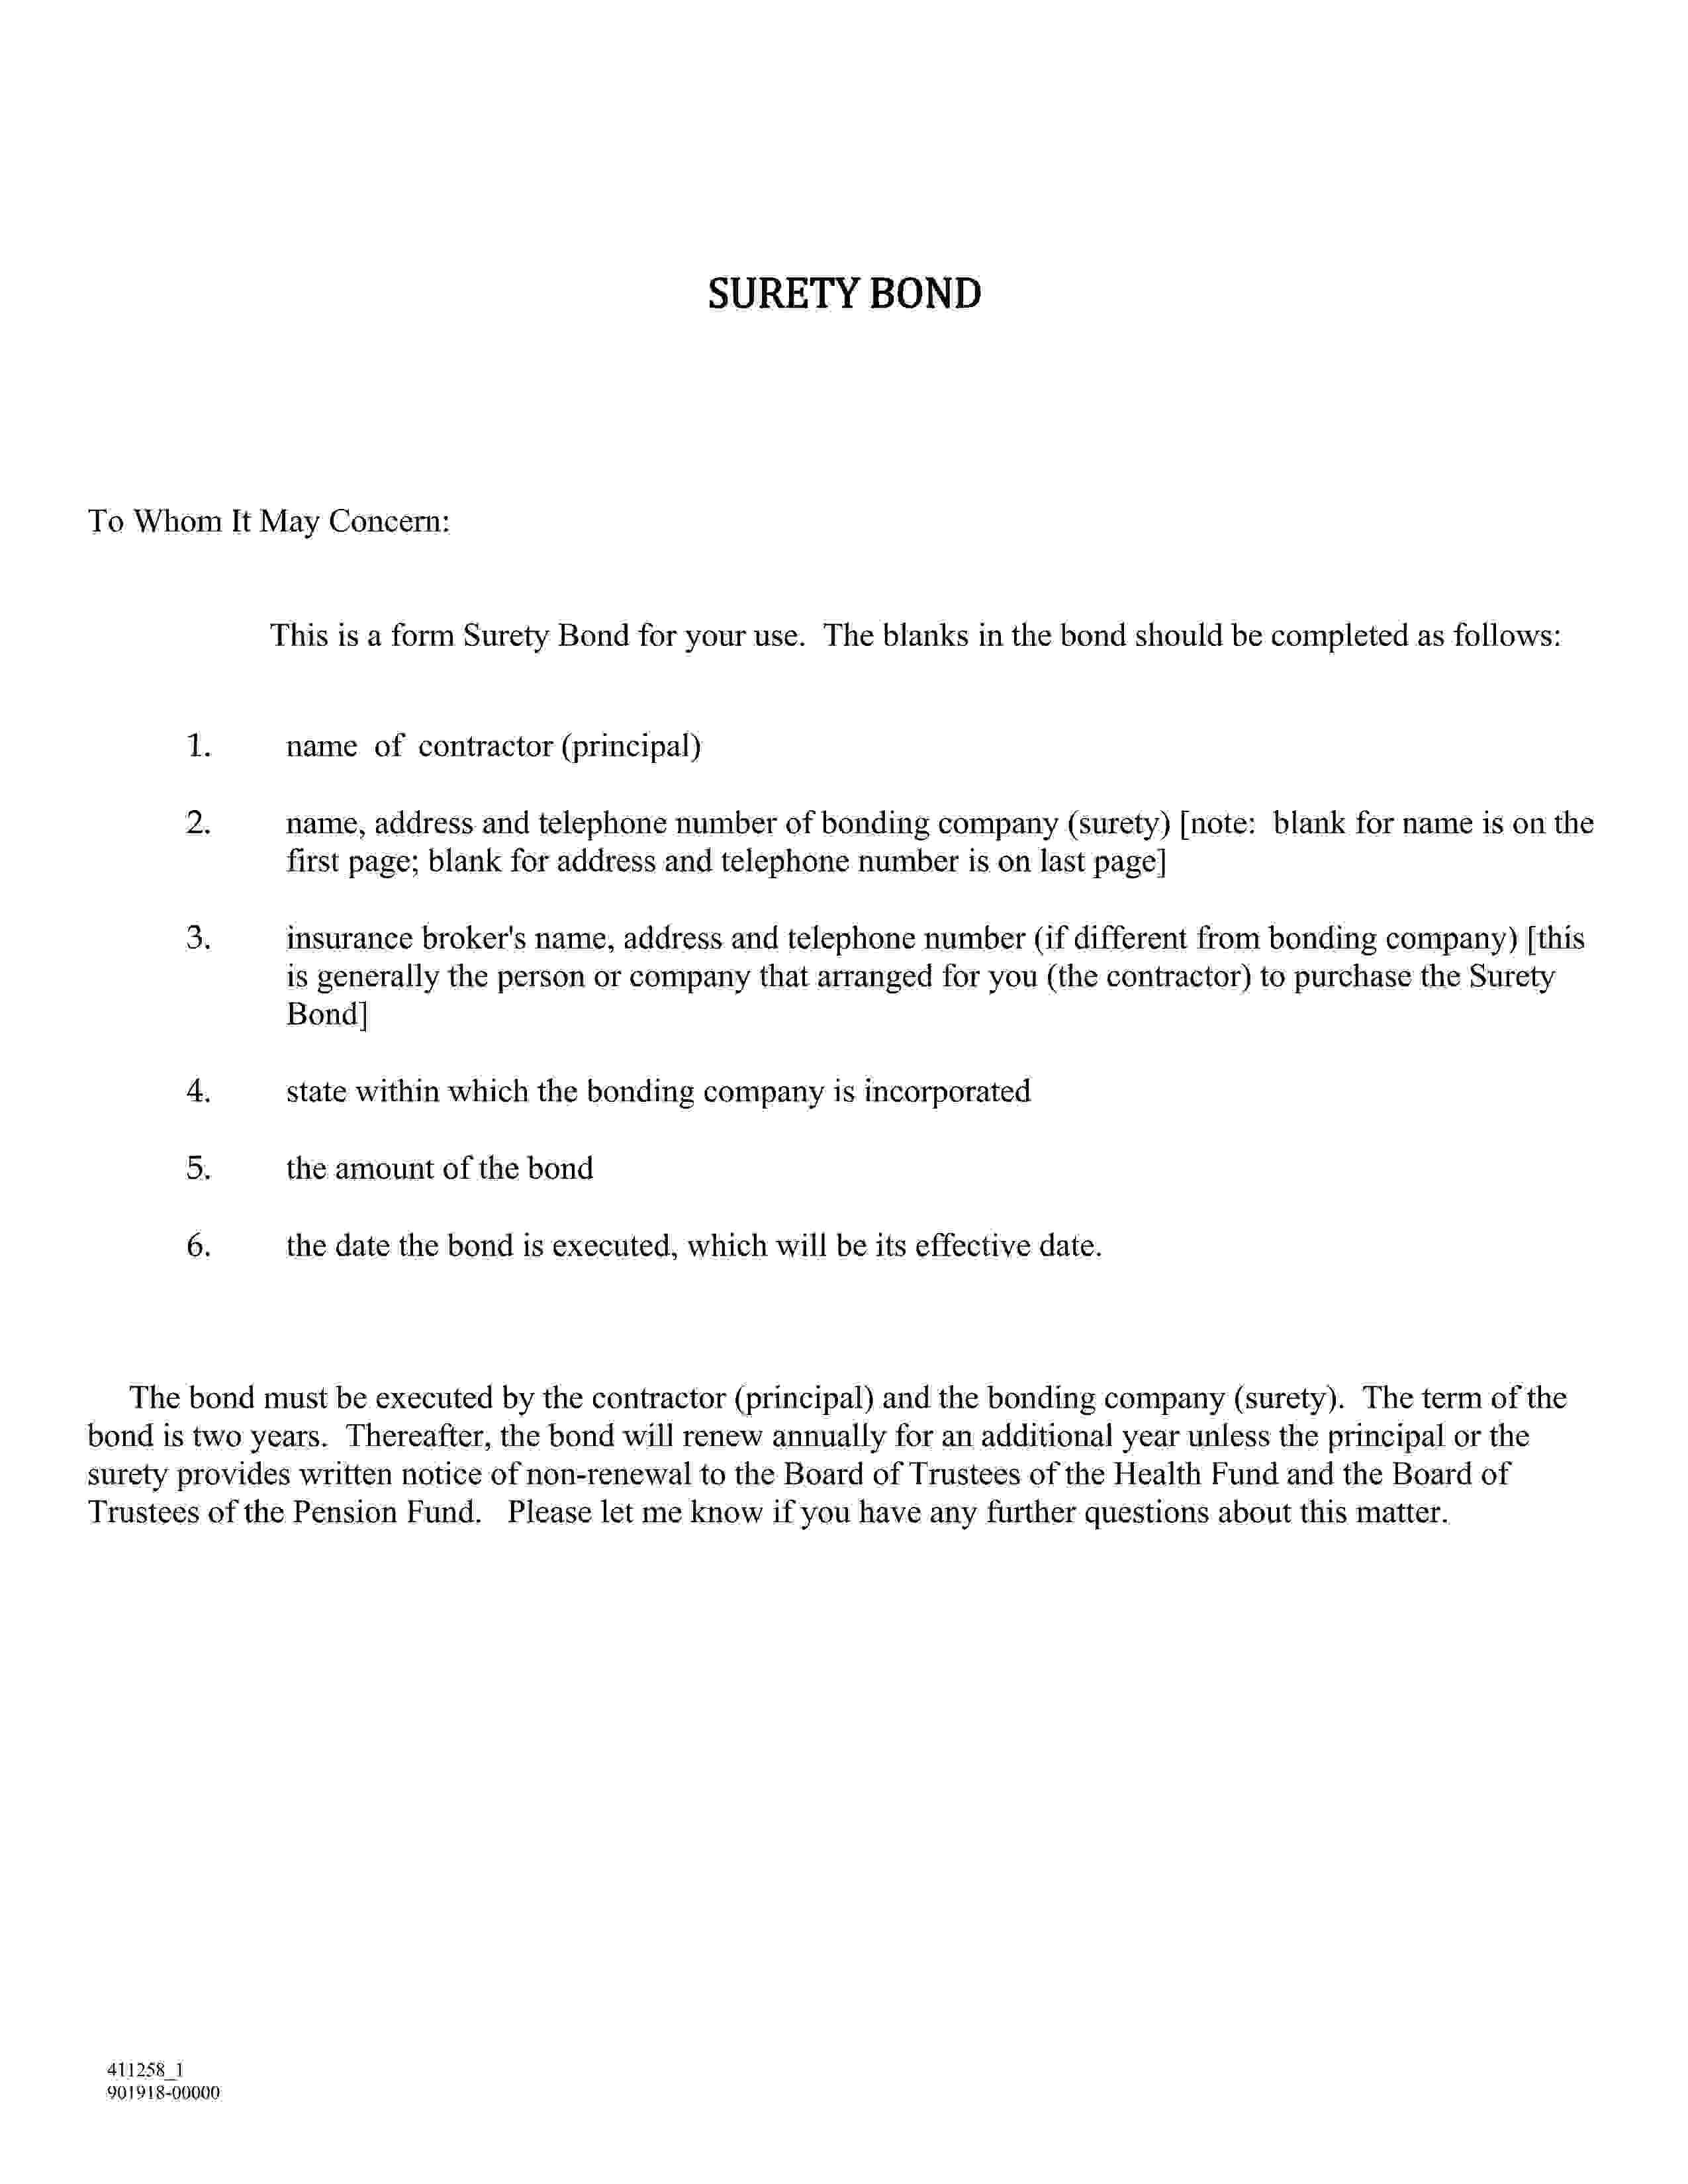 Local Union 613 of the IBEW Fringe Benefits sample image